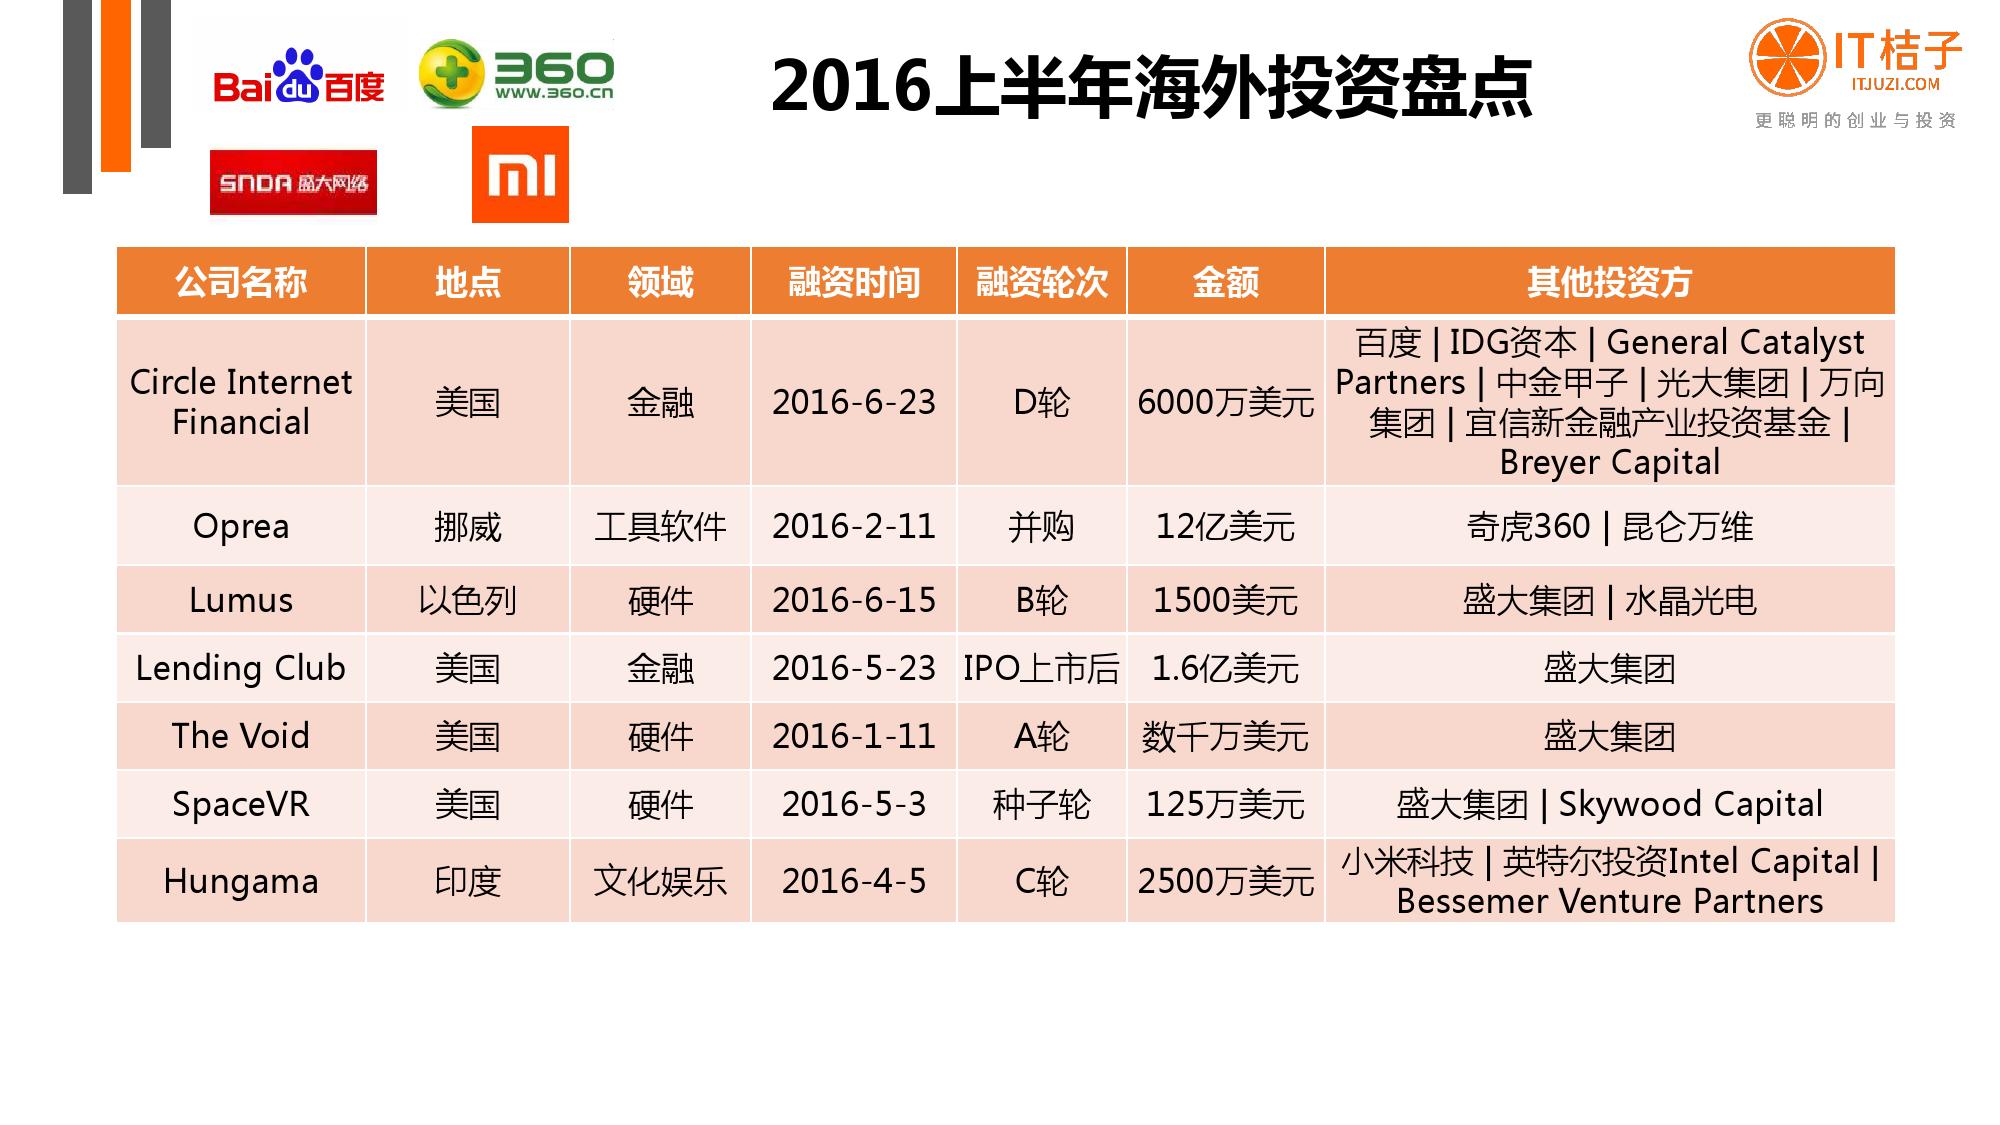 【IT桔子】2016年Q2中国互联网创业投资分析报告_000055